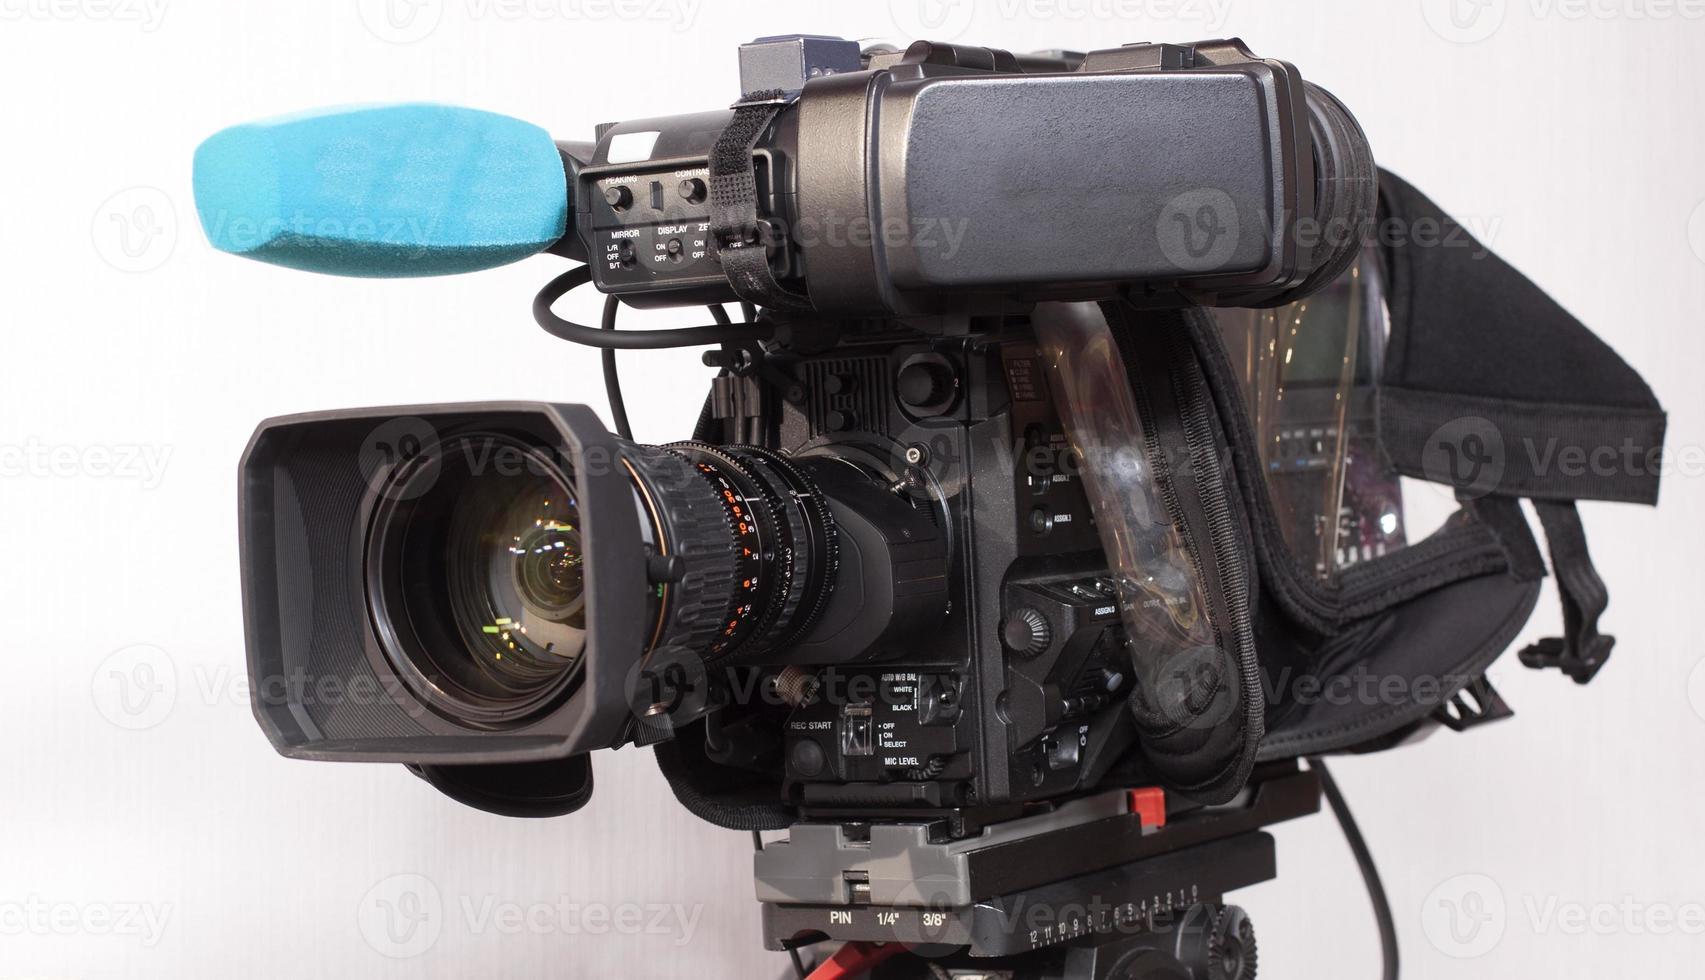 professionele digitale videocamera. foto